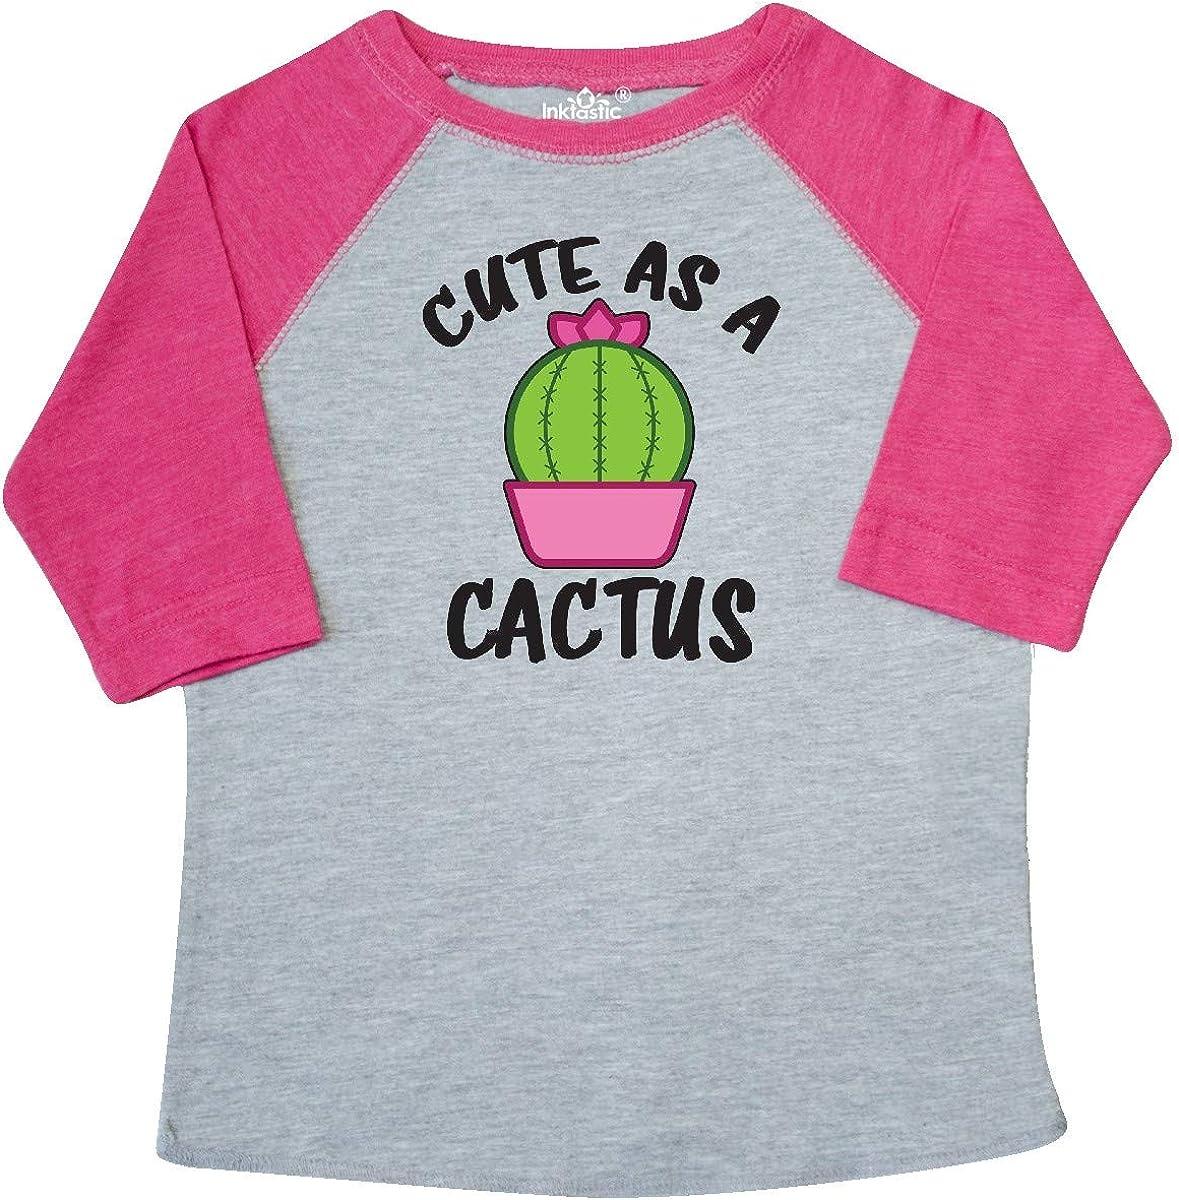 inktastic Cute As a Cactus Toddler T-Shirt